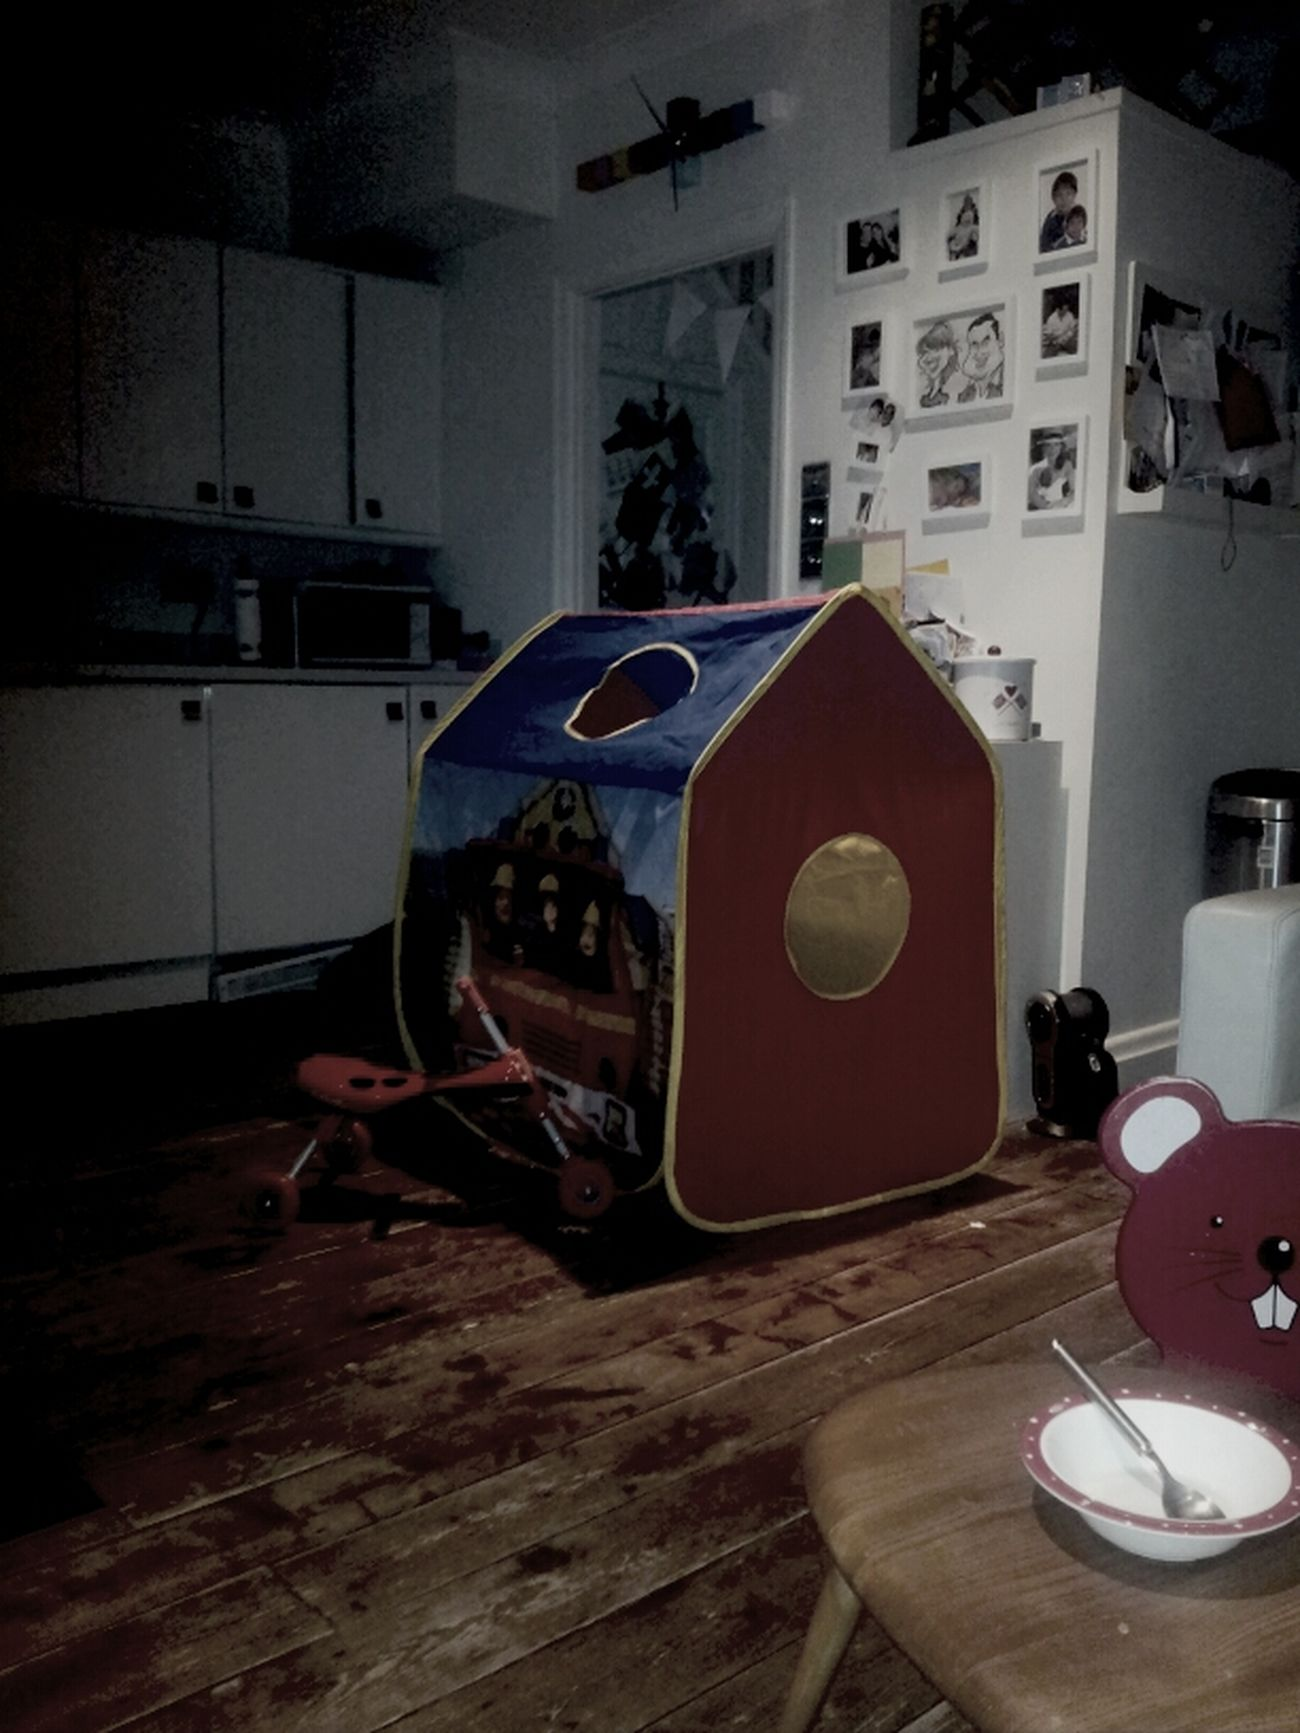 The Christmas Tent...